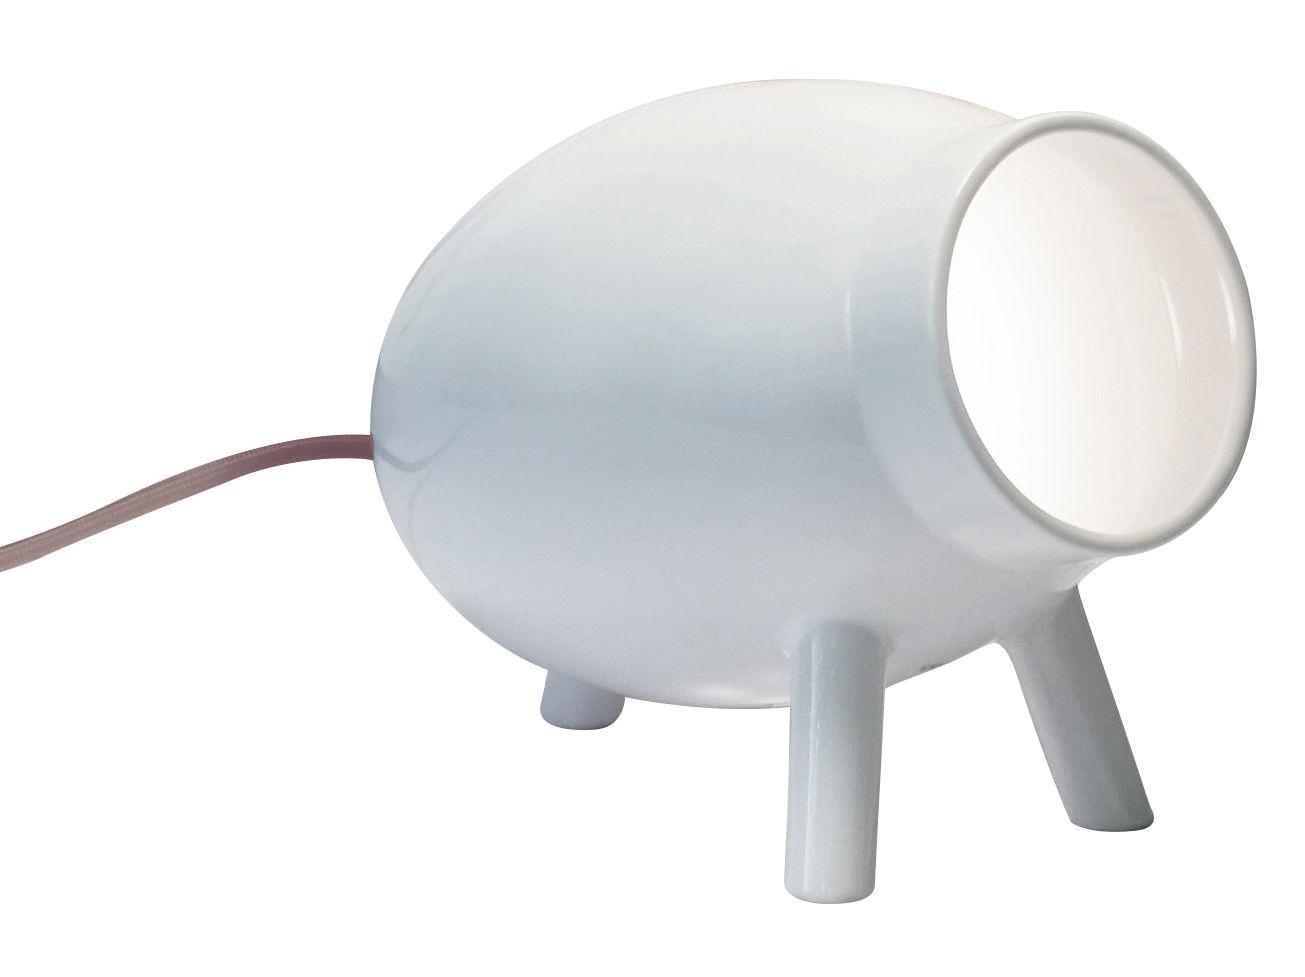 lampe de table lumoid c ramique fait main blanc. Black Bedroom Furniture Sets. Home Design Ideas